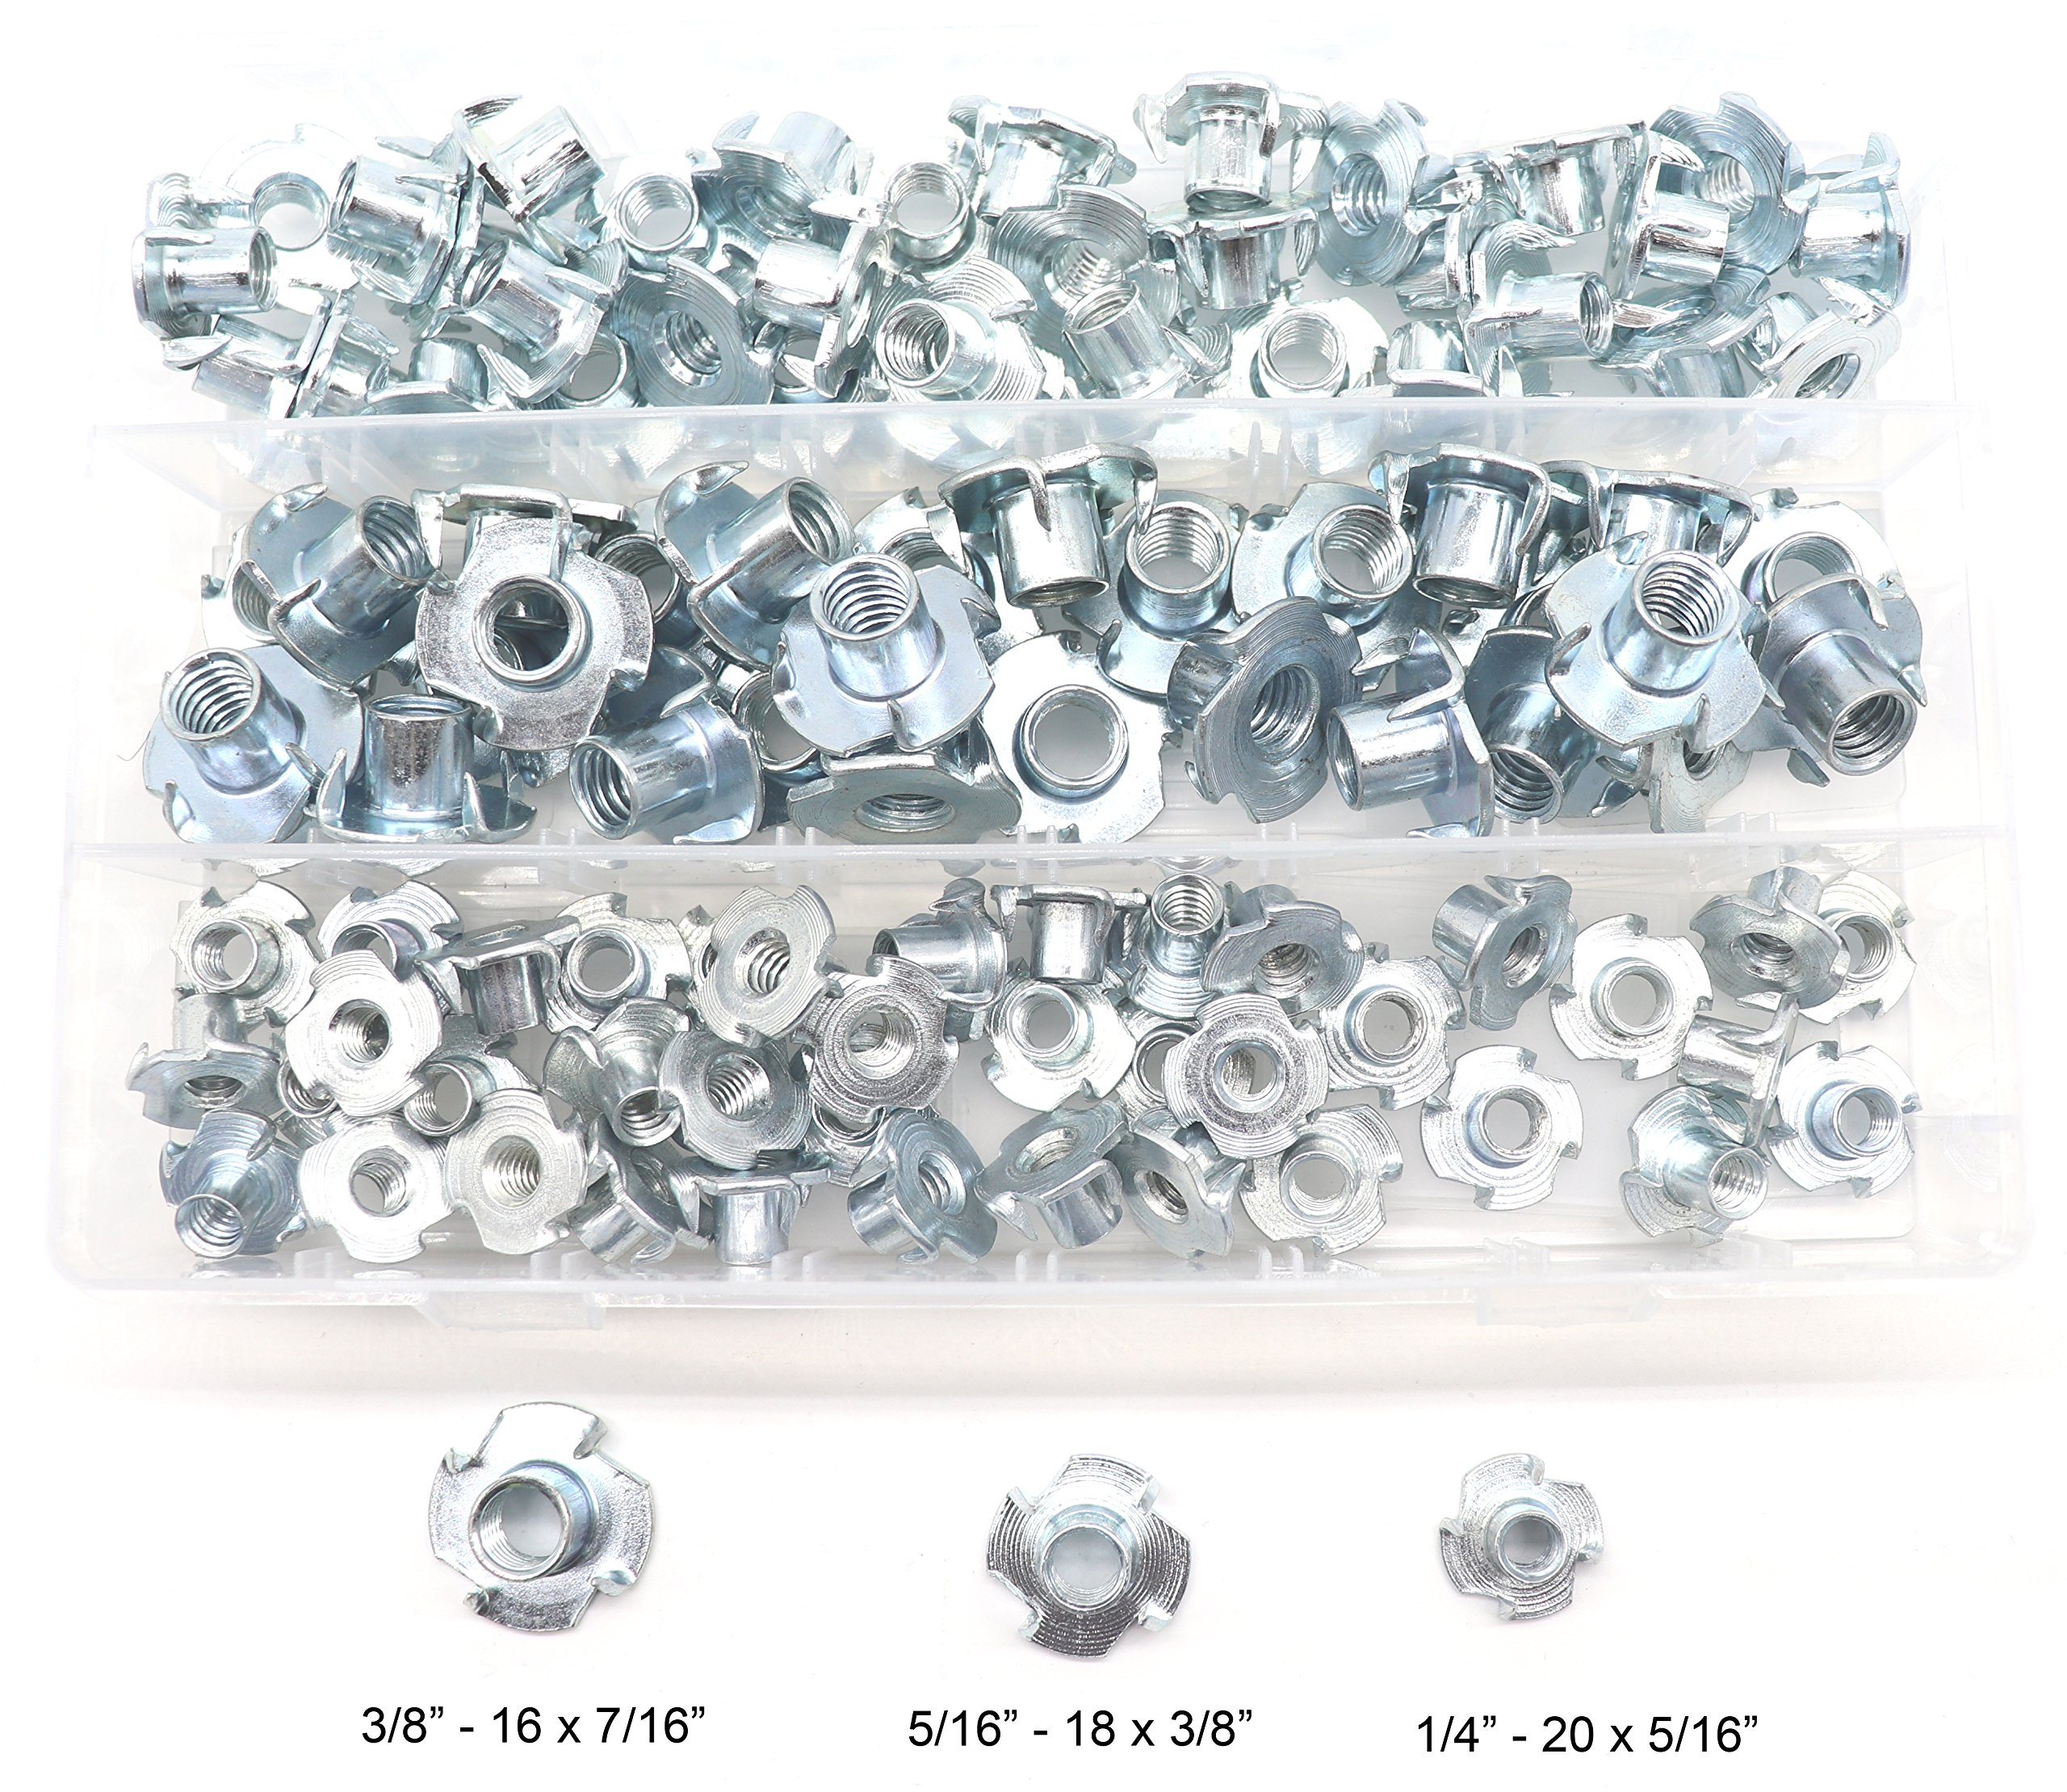 Carbon Steel T-Nuts Zinc Plated 5//16-18 3//8-16 4 Pronged Tee Nut Assortment Kit 5//16-18 binifiMux 105 Pack 1//4-20 3//8-16 4 Pronged Tee Nut Assortment Kit